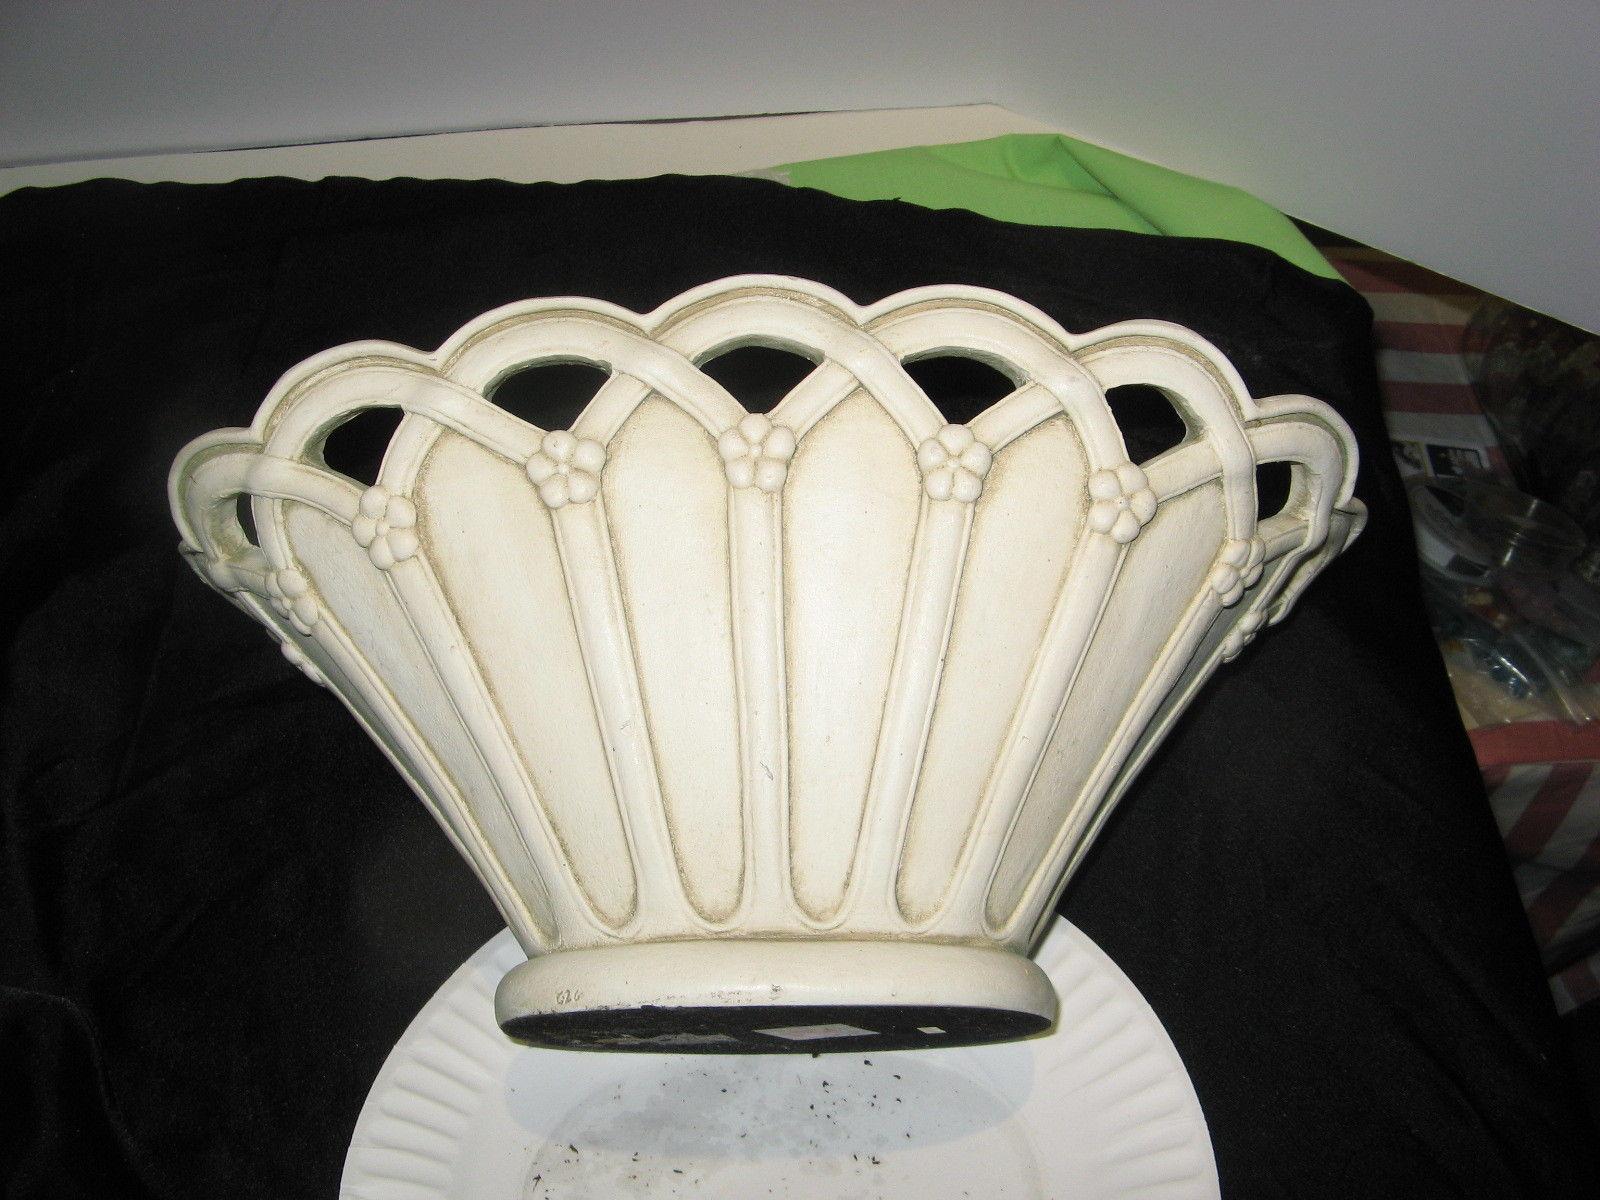 inspirational wedding bathroom basket décor-Fancy Wedding Bathroom Basket Inspiration